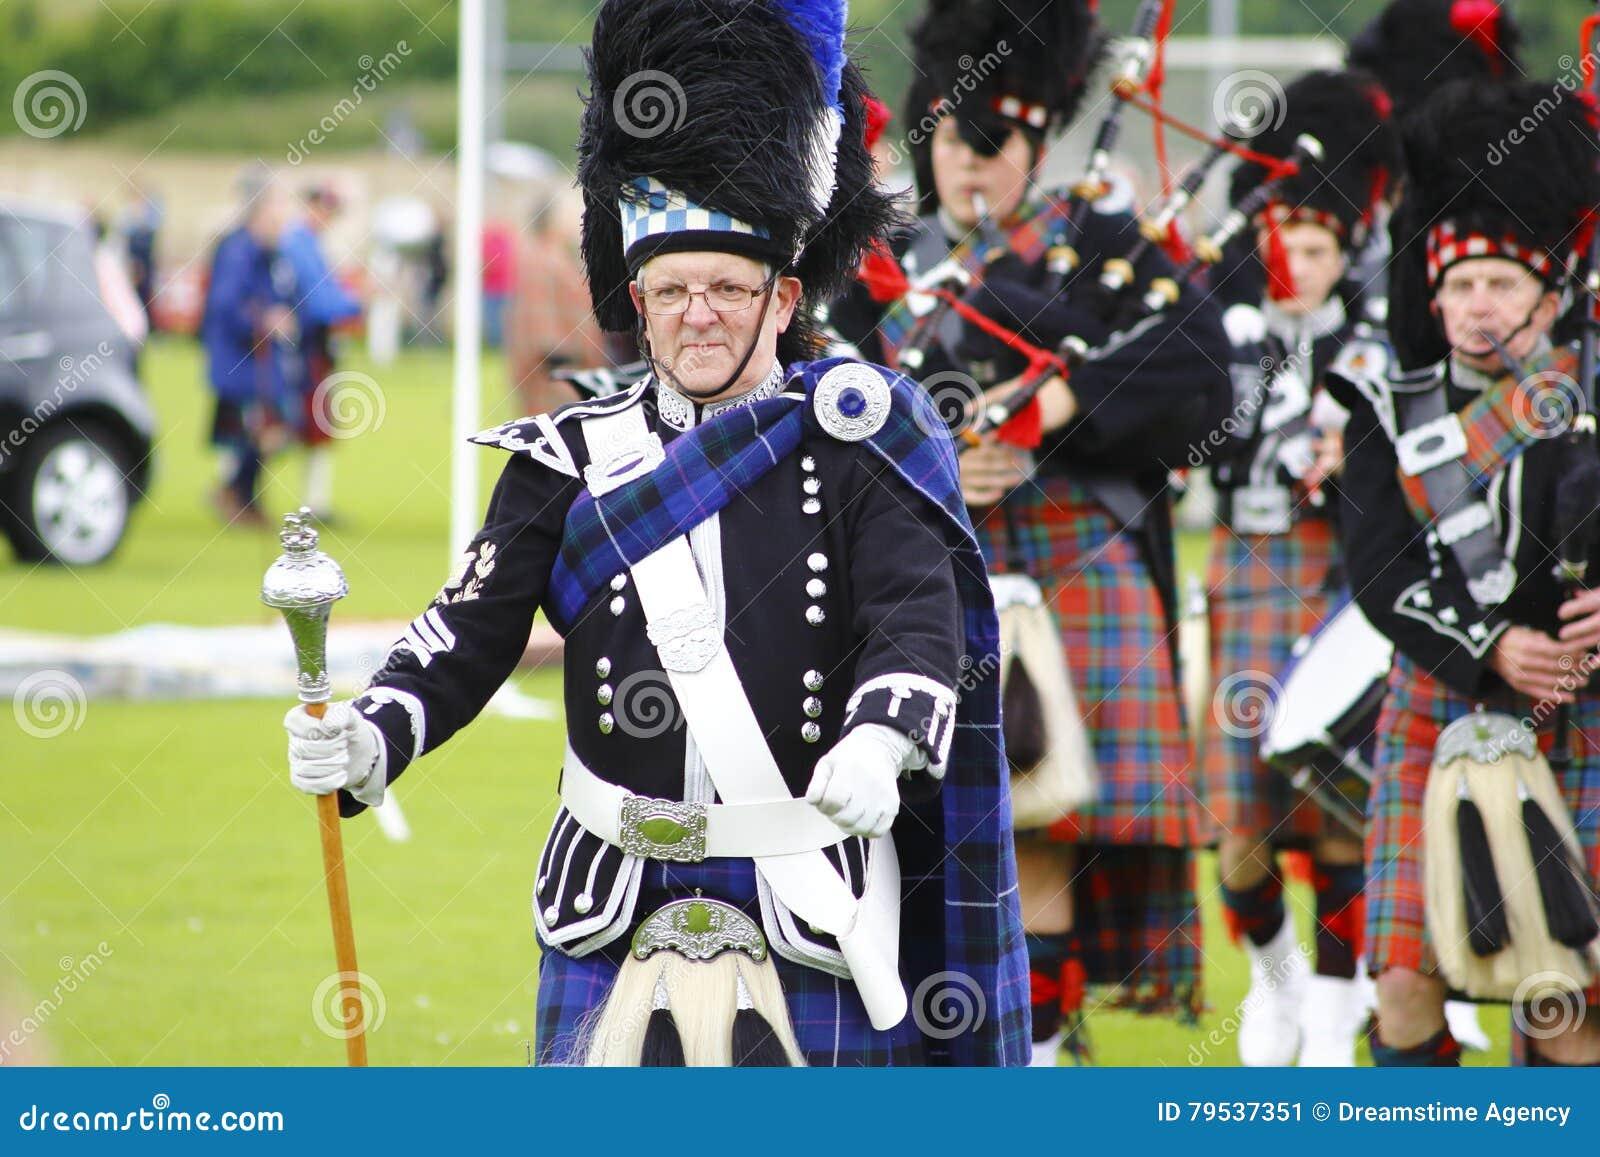 Pipe band at Newtonmore highland games